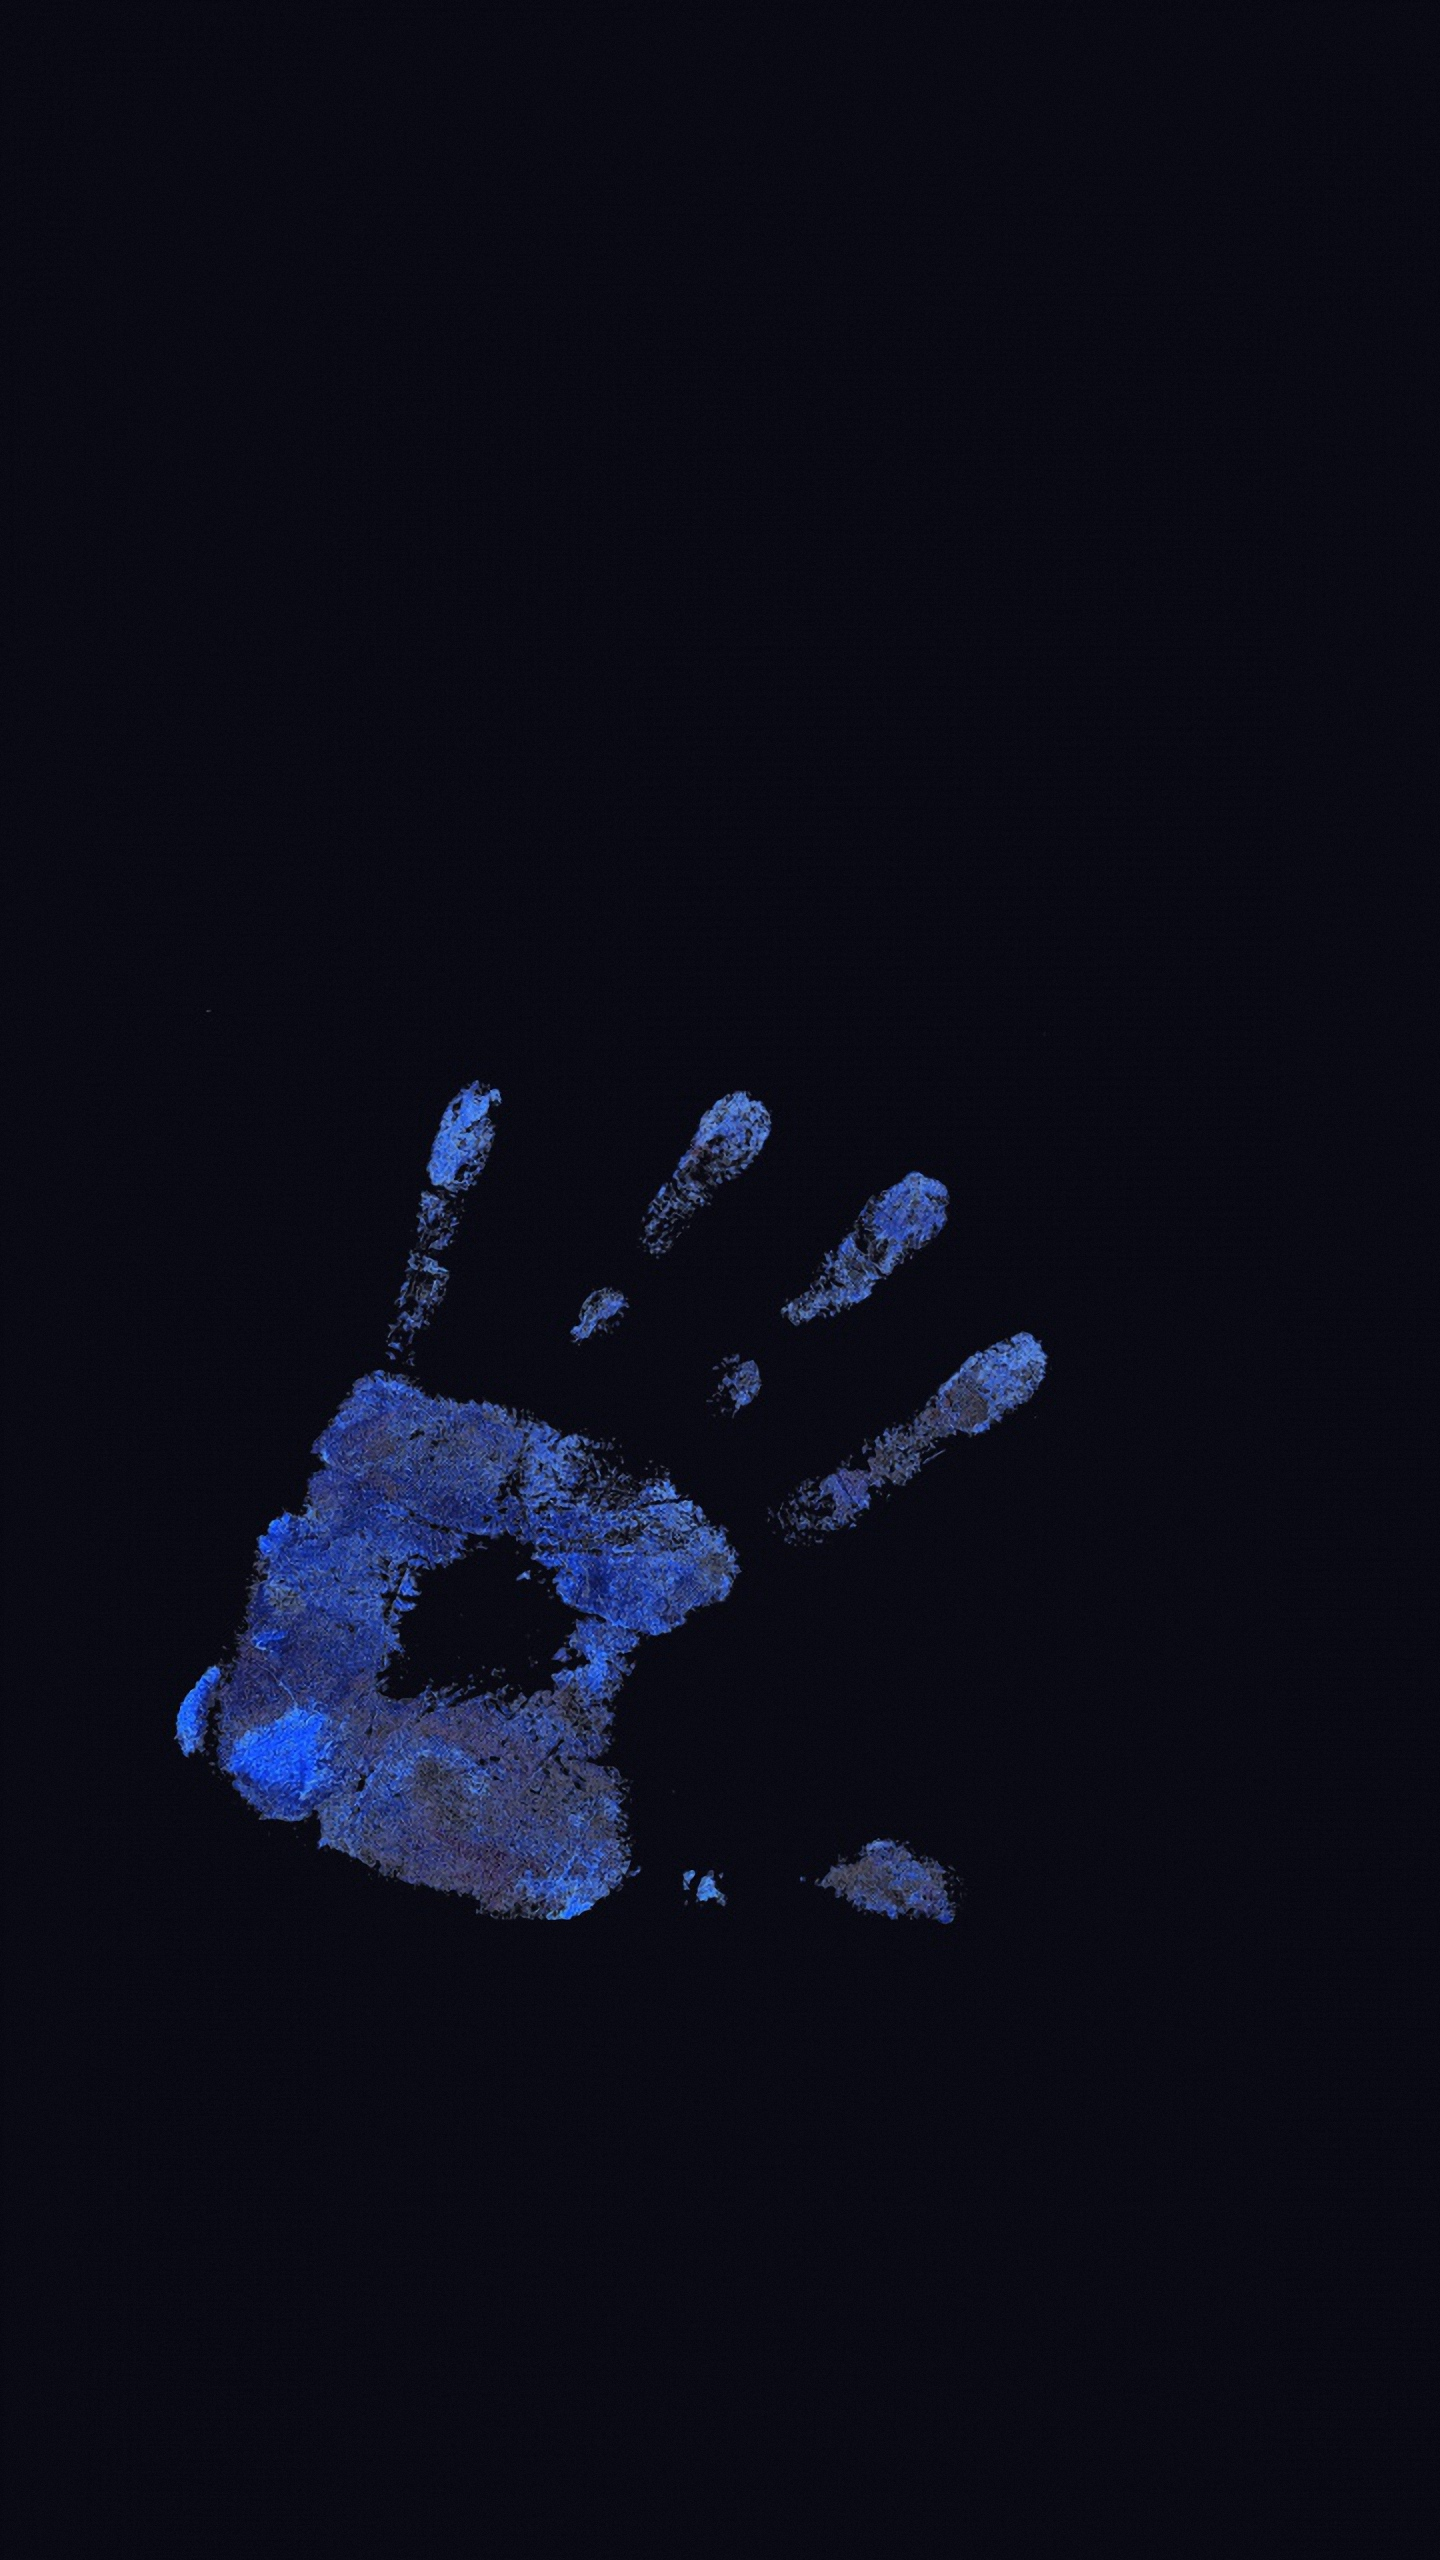 Free Download Lg G3 Hd 1440x2560 Hand Print Black Lg G3